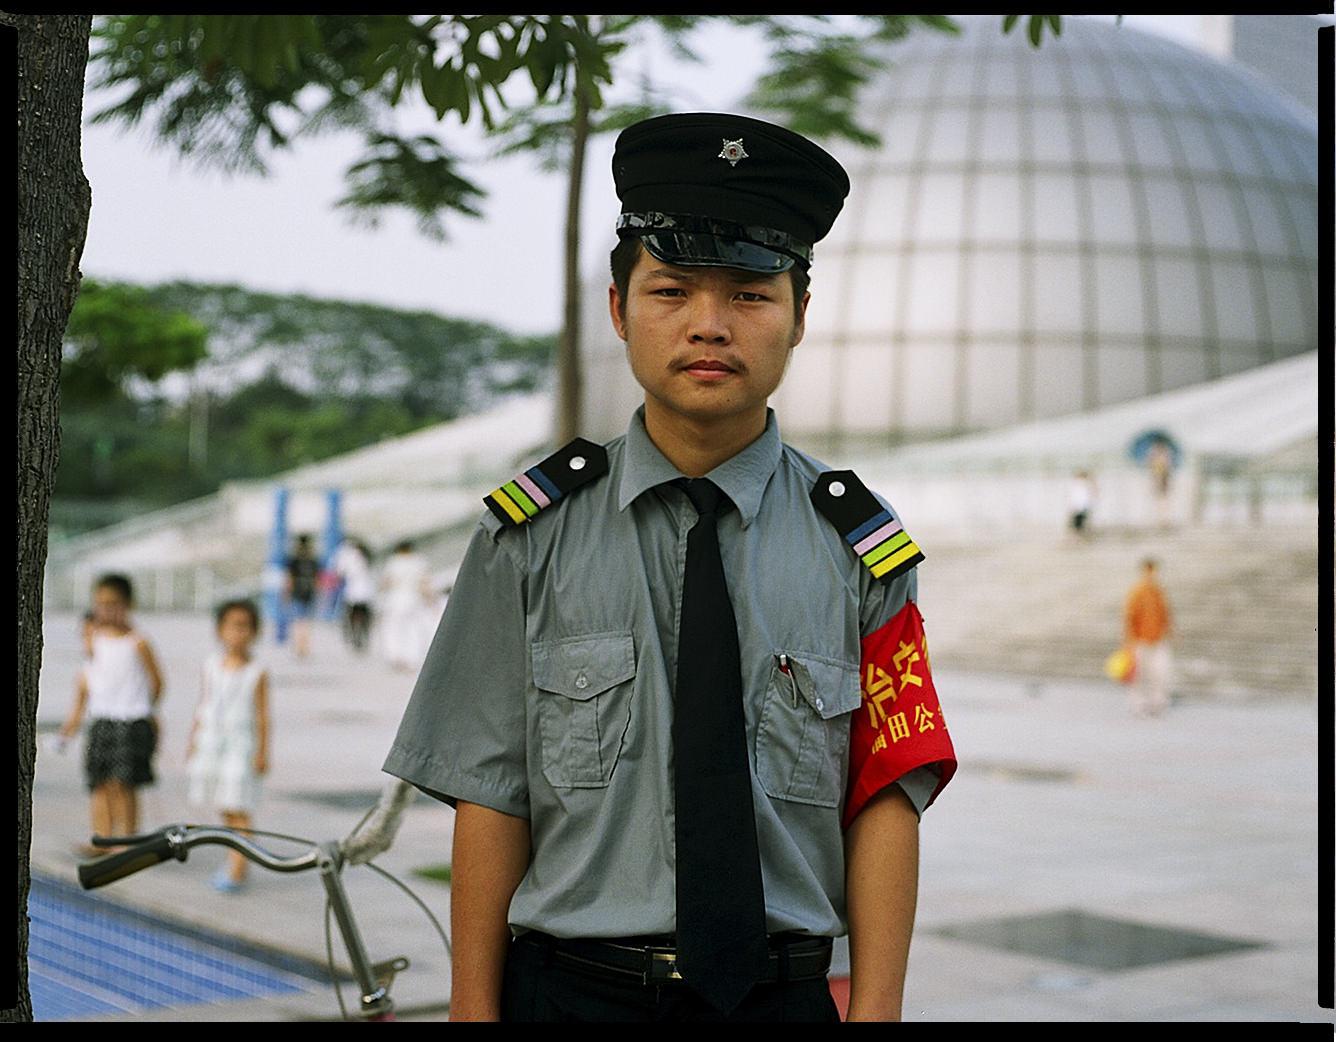 MediumFormatPatrikWallner_Shenzhen_SecurityGuardWithBikeLOWQ